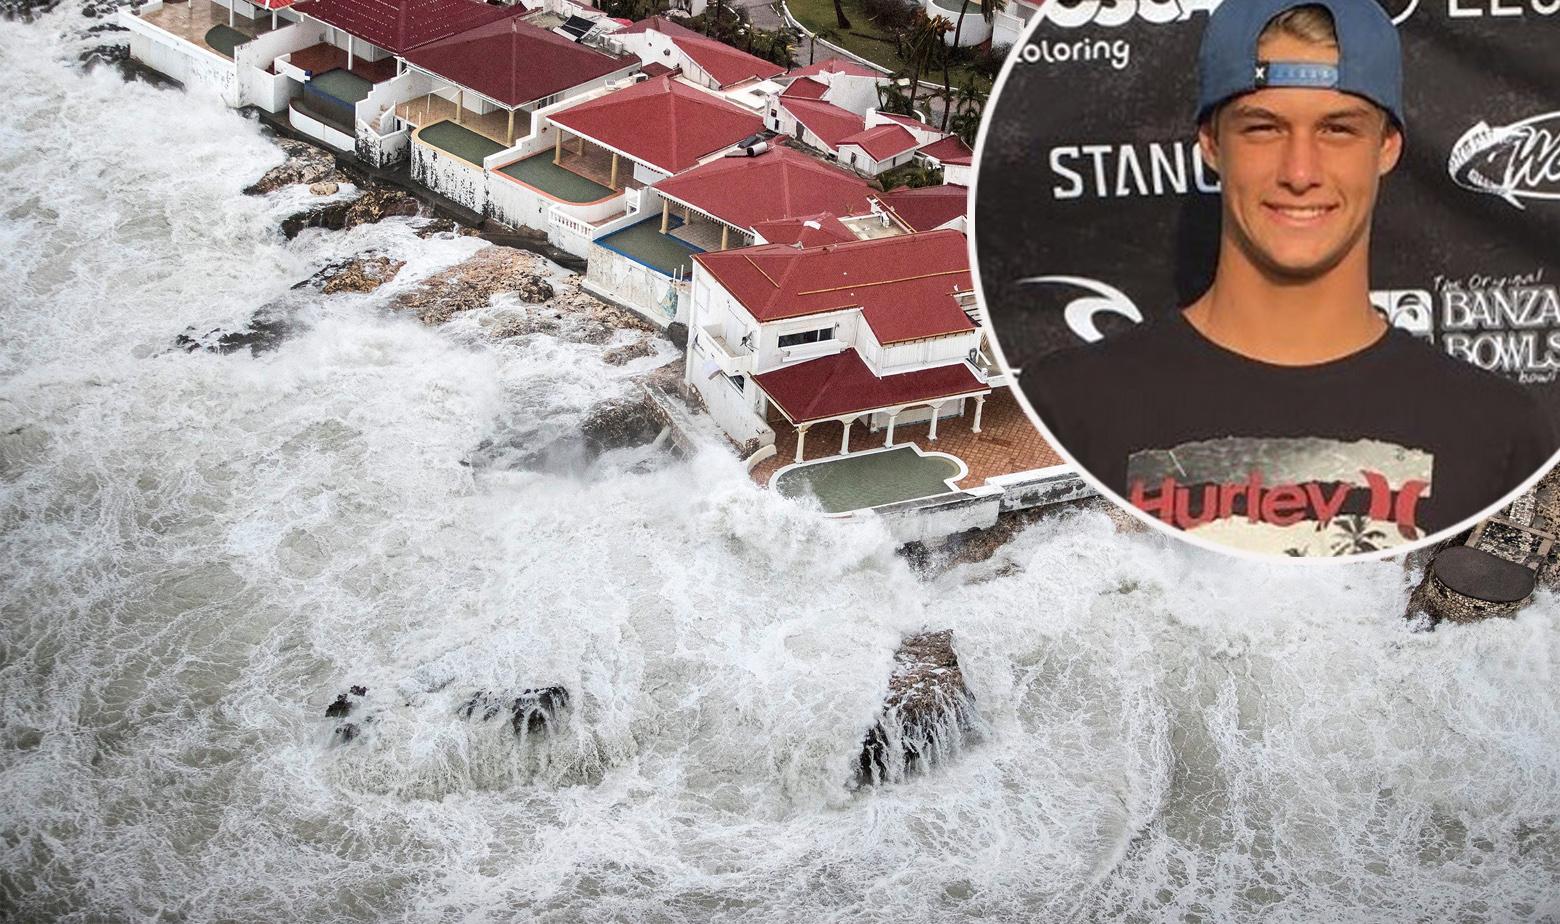 Val uragan Irma surfer Venezia